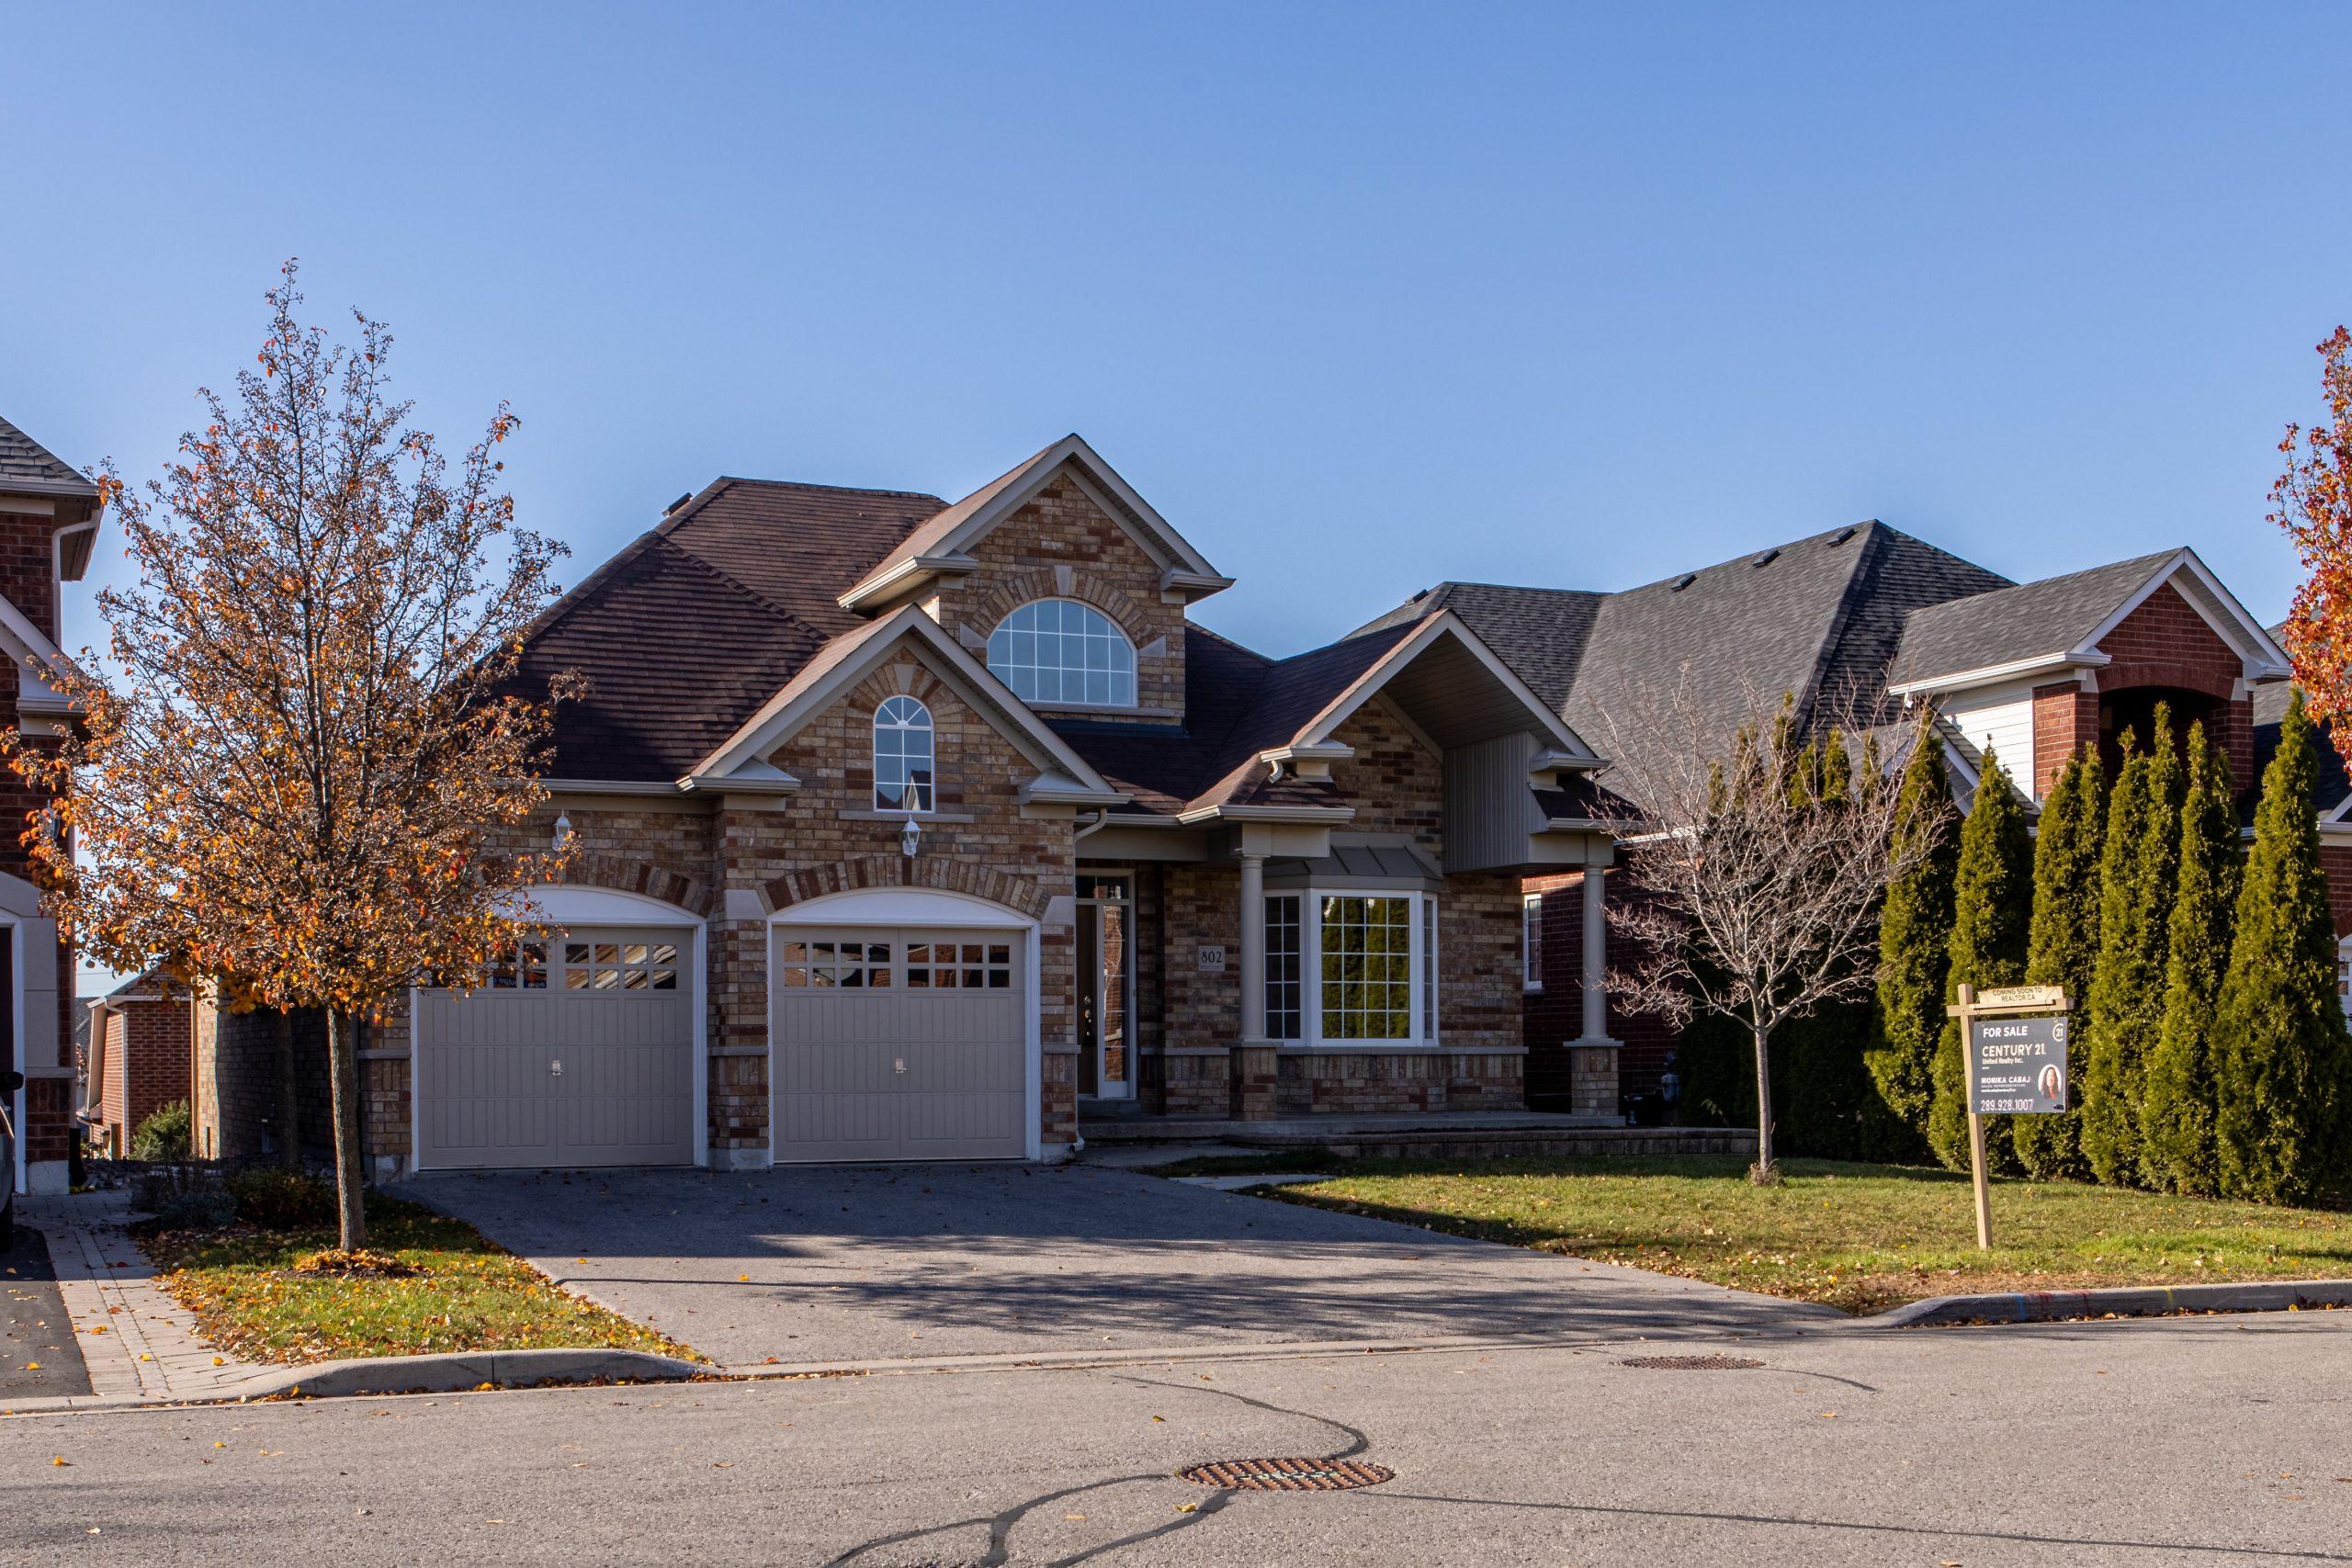 Buy Houses | John Medina Buys Houses